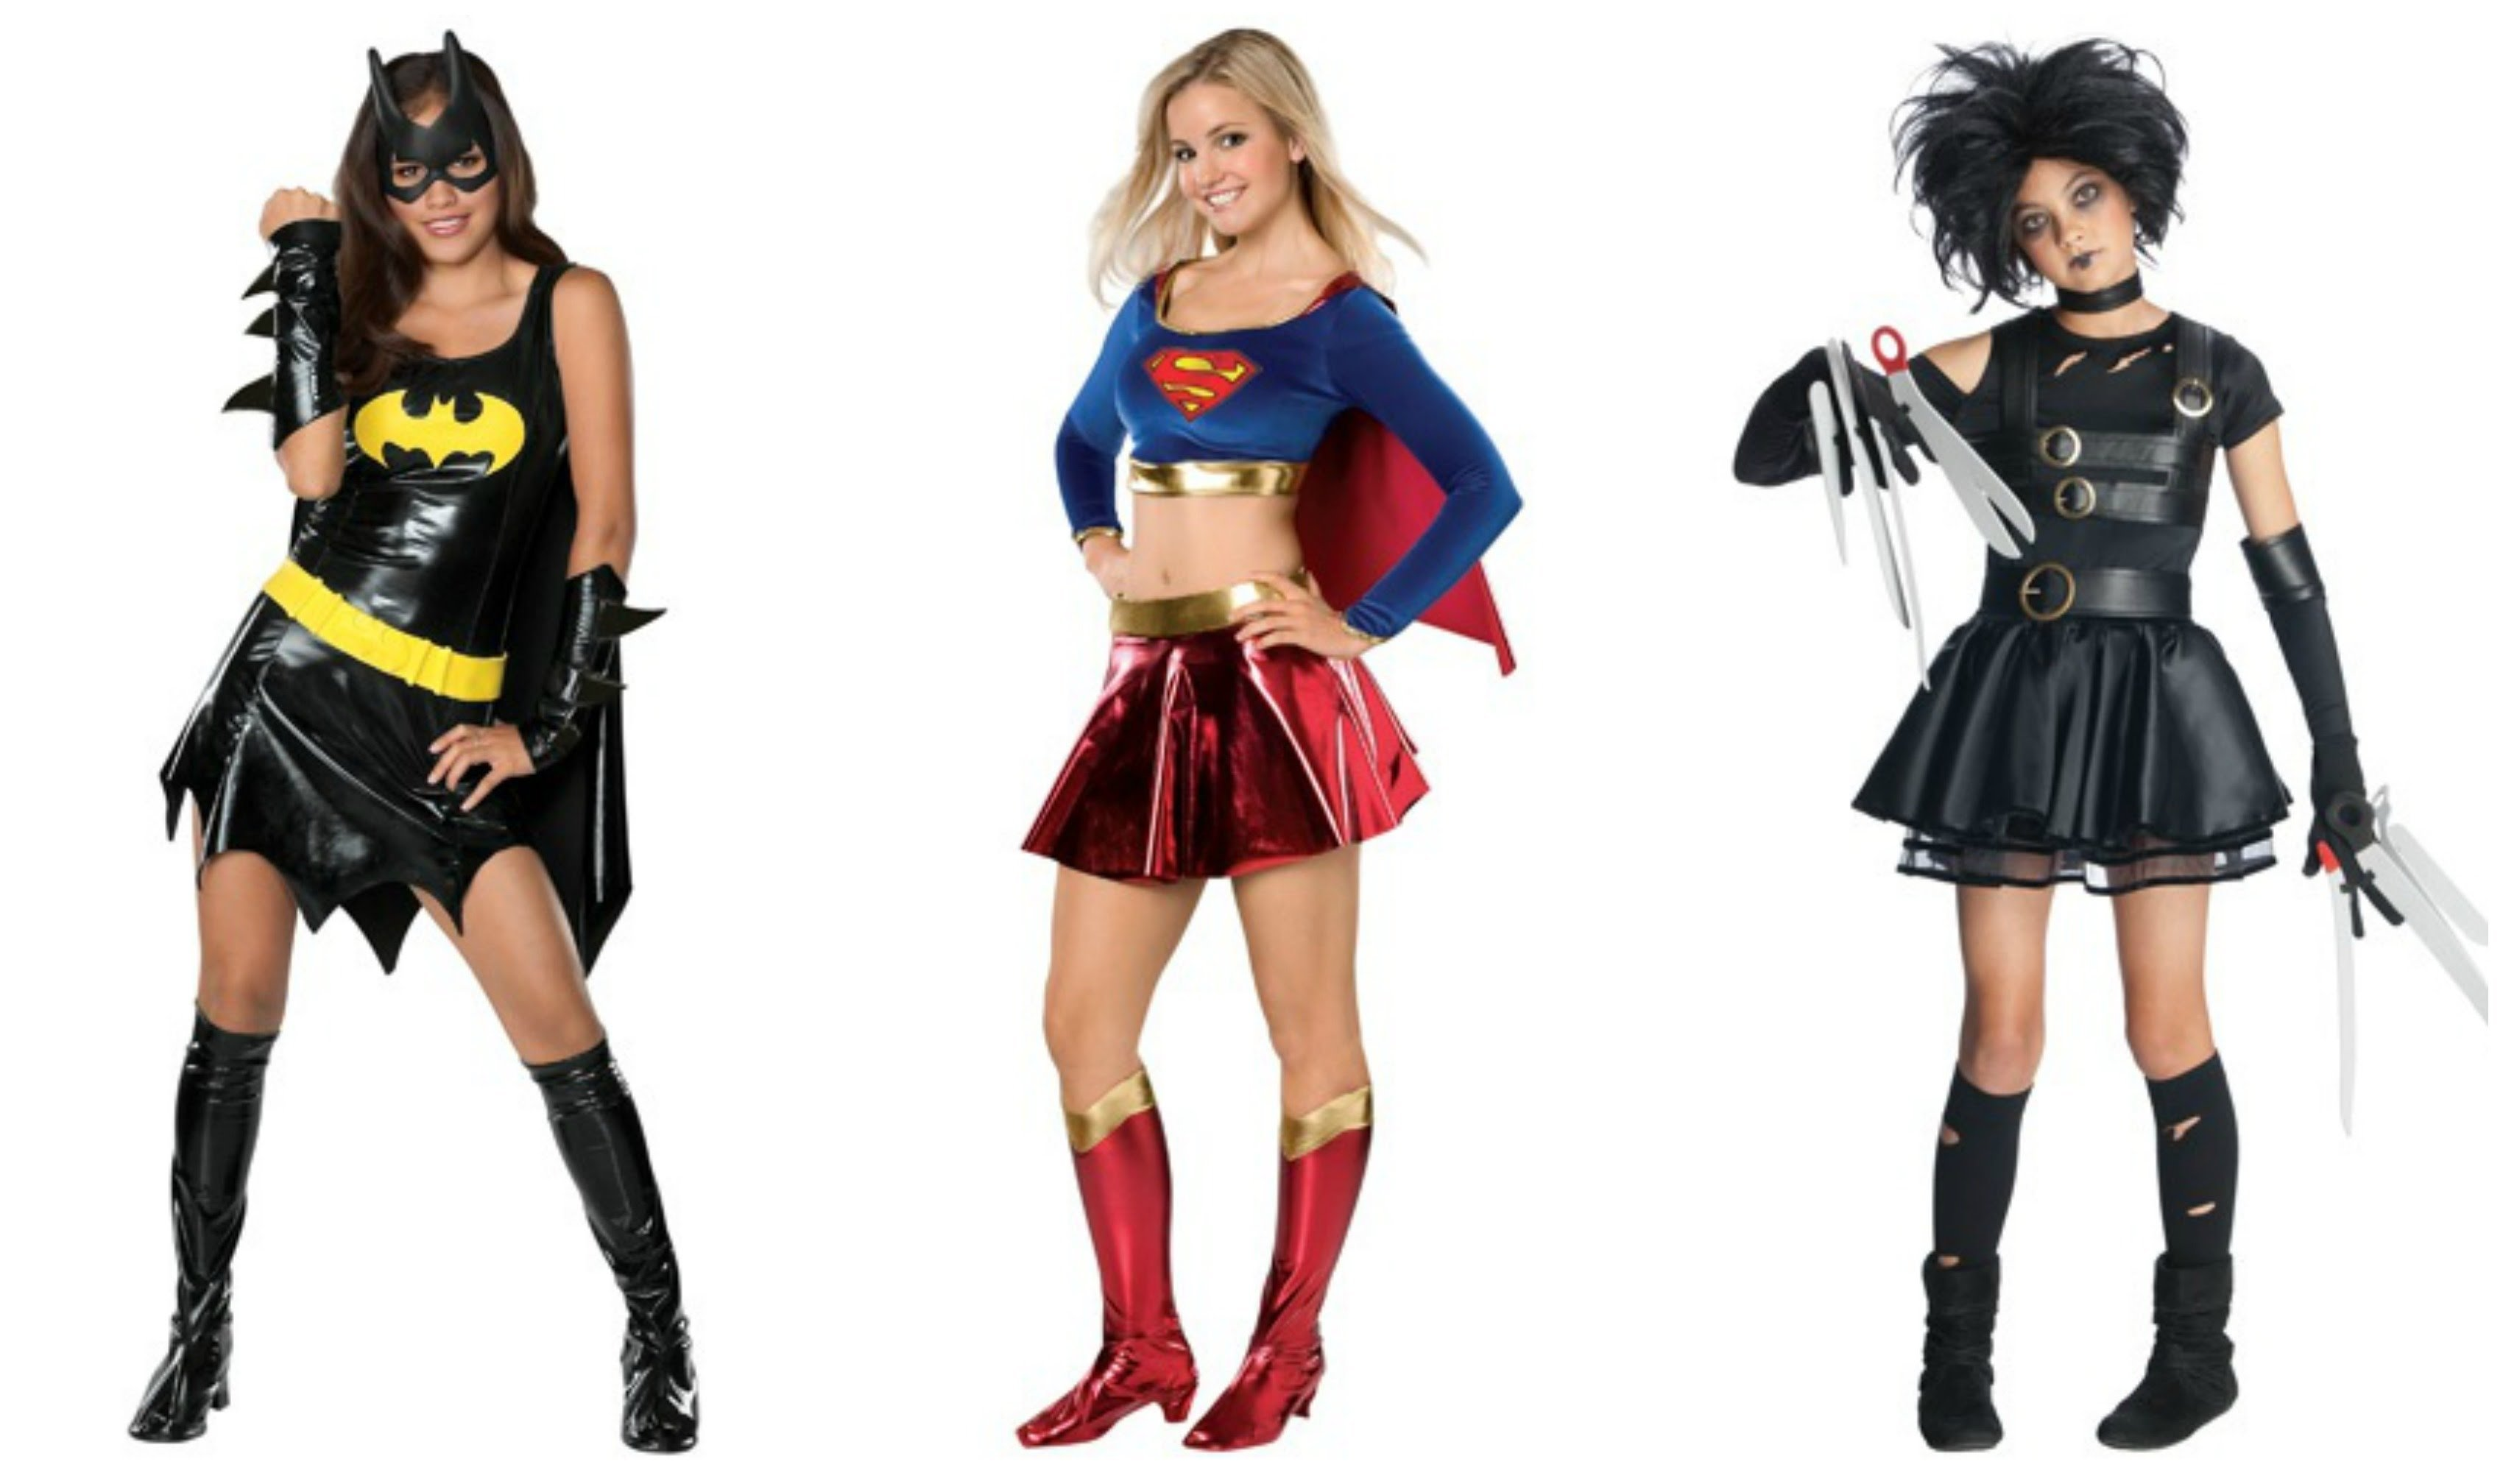 10 Great Teenage Girl Costume Ideas Halloween halloween costume ideas for teens girls youtube halloween costumes 10 2020